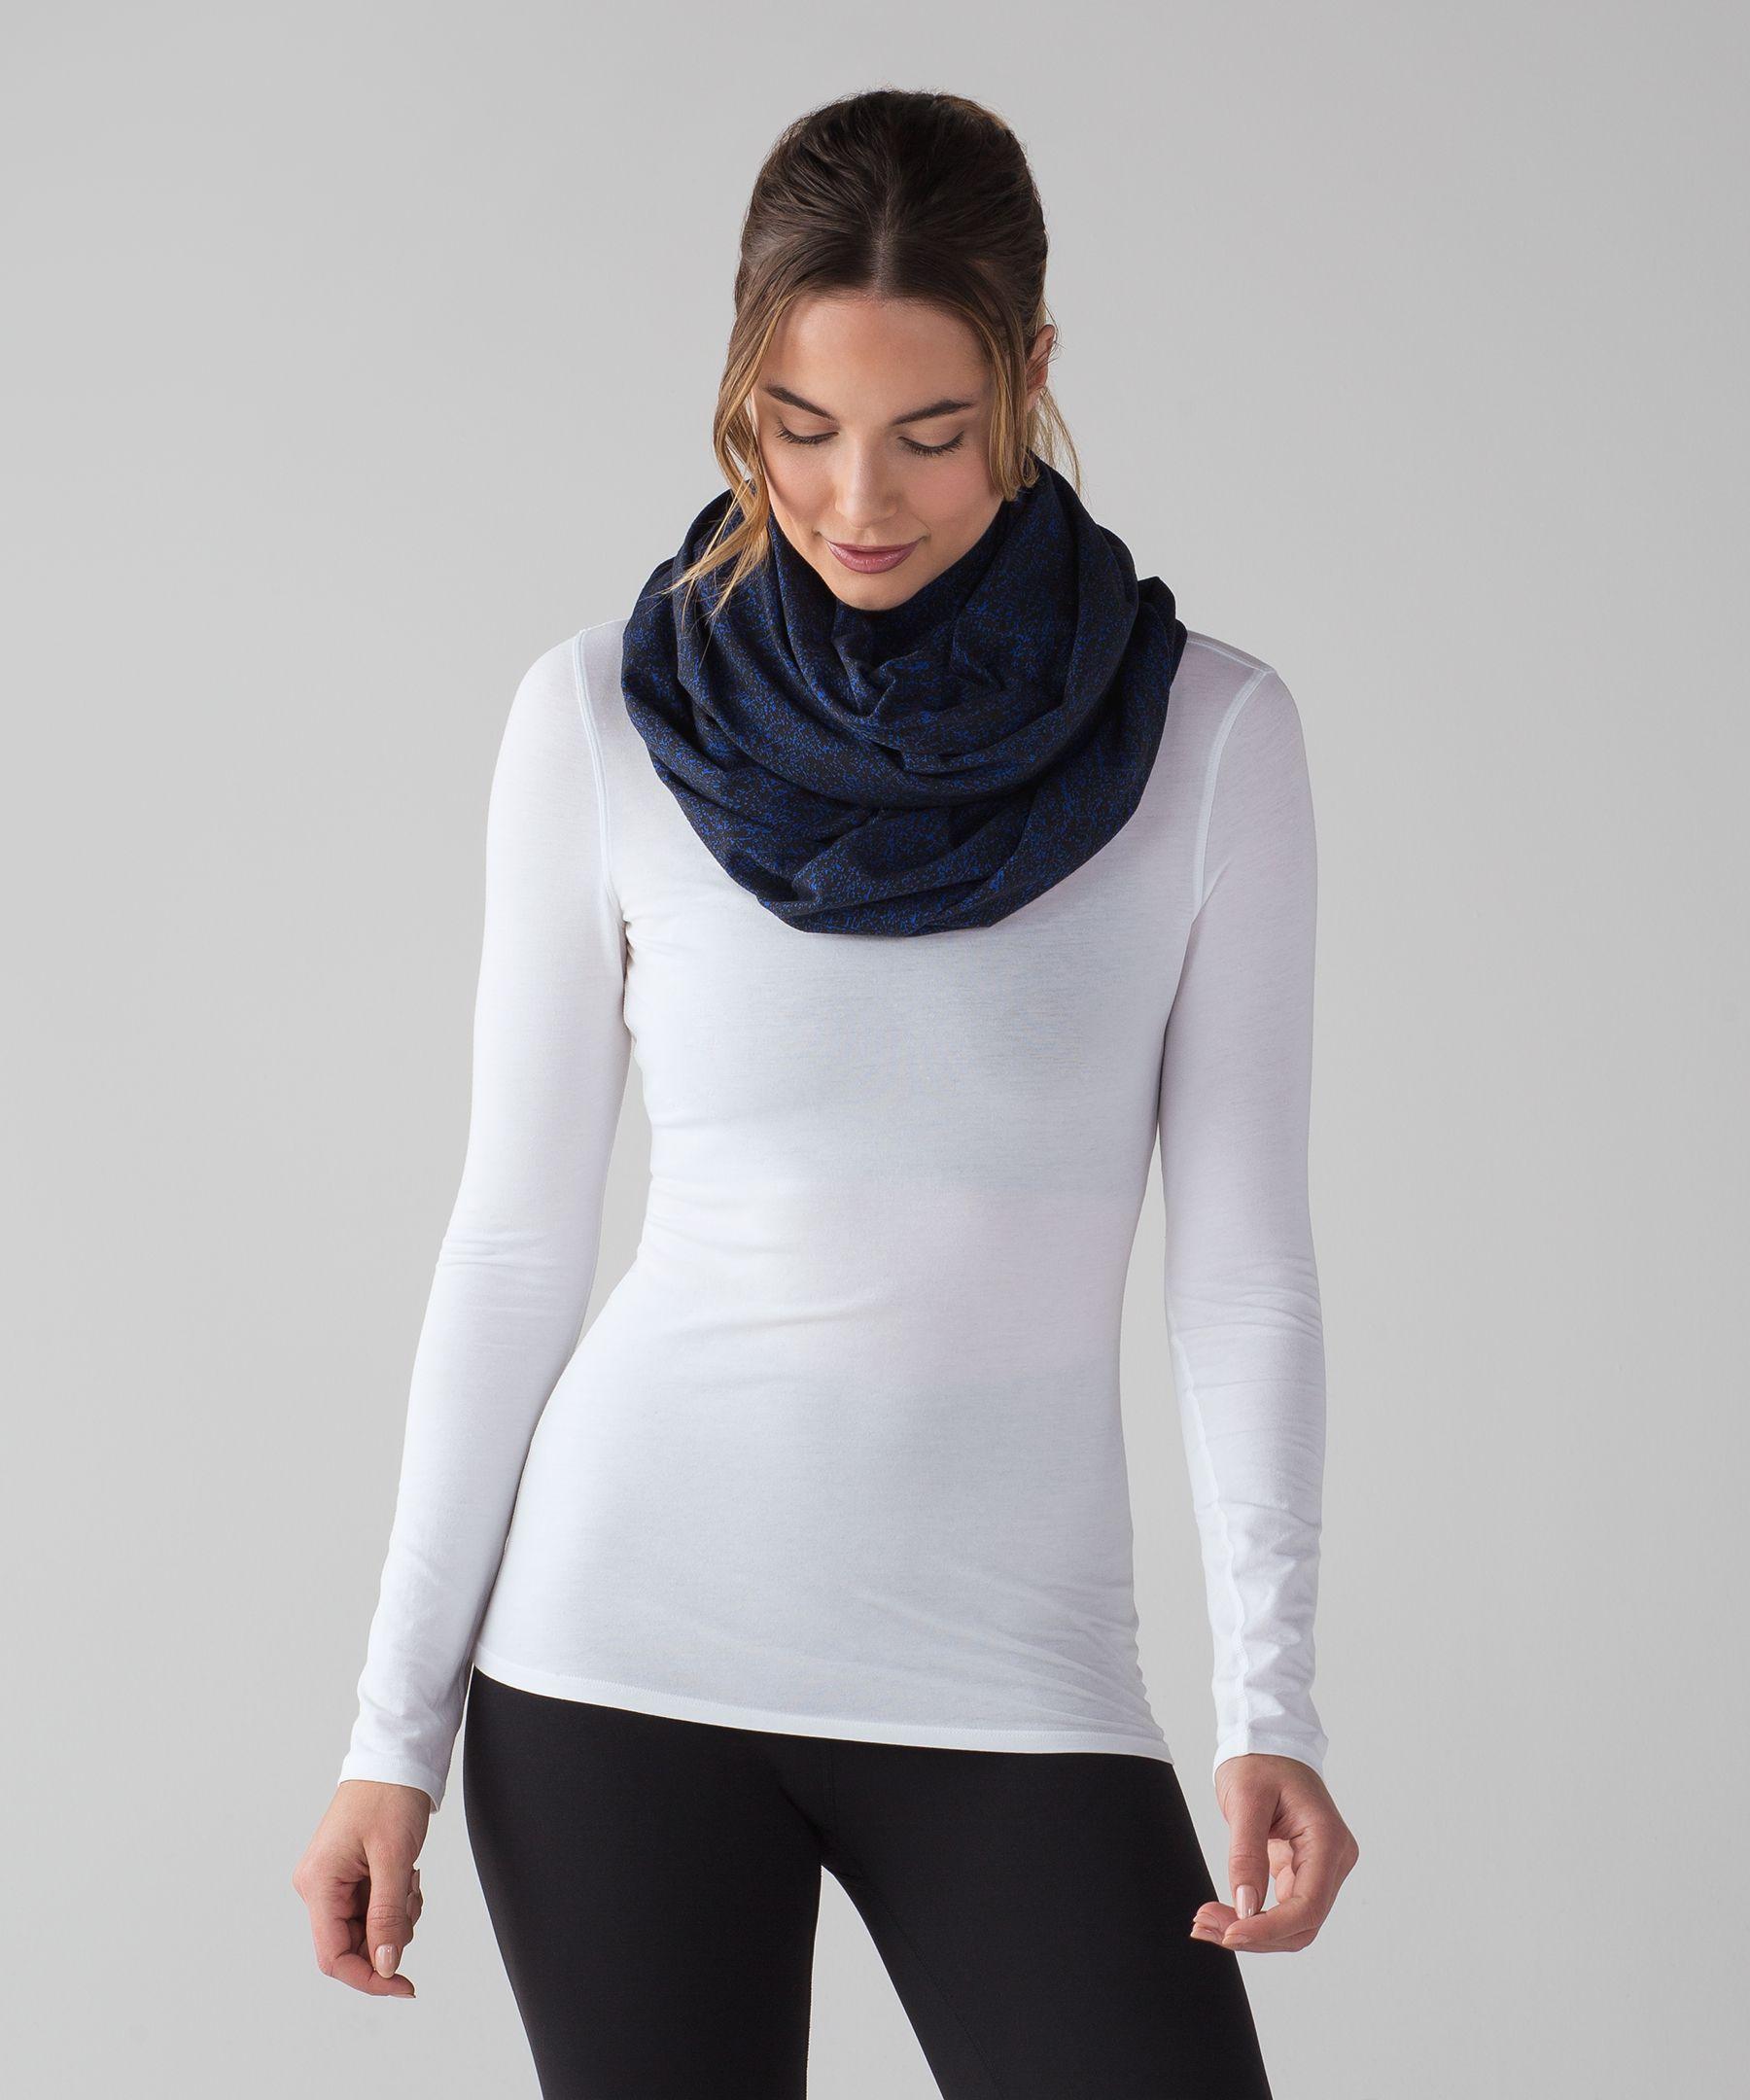 vinyasa scarf rulu s scarves gloves lululemon